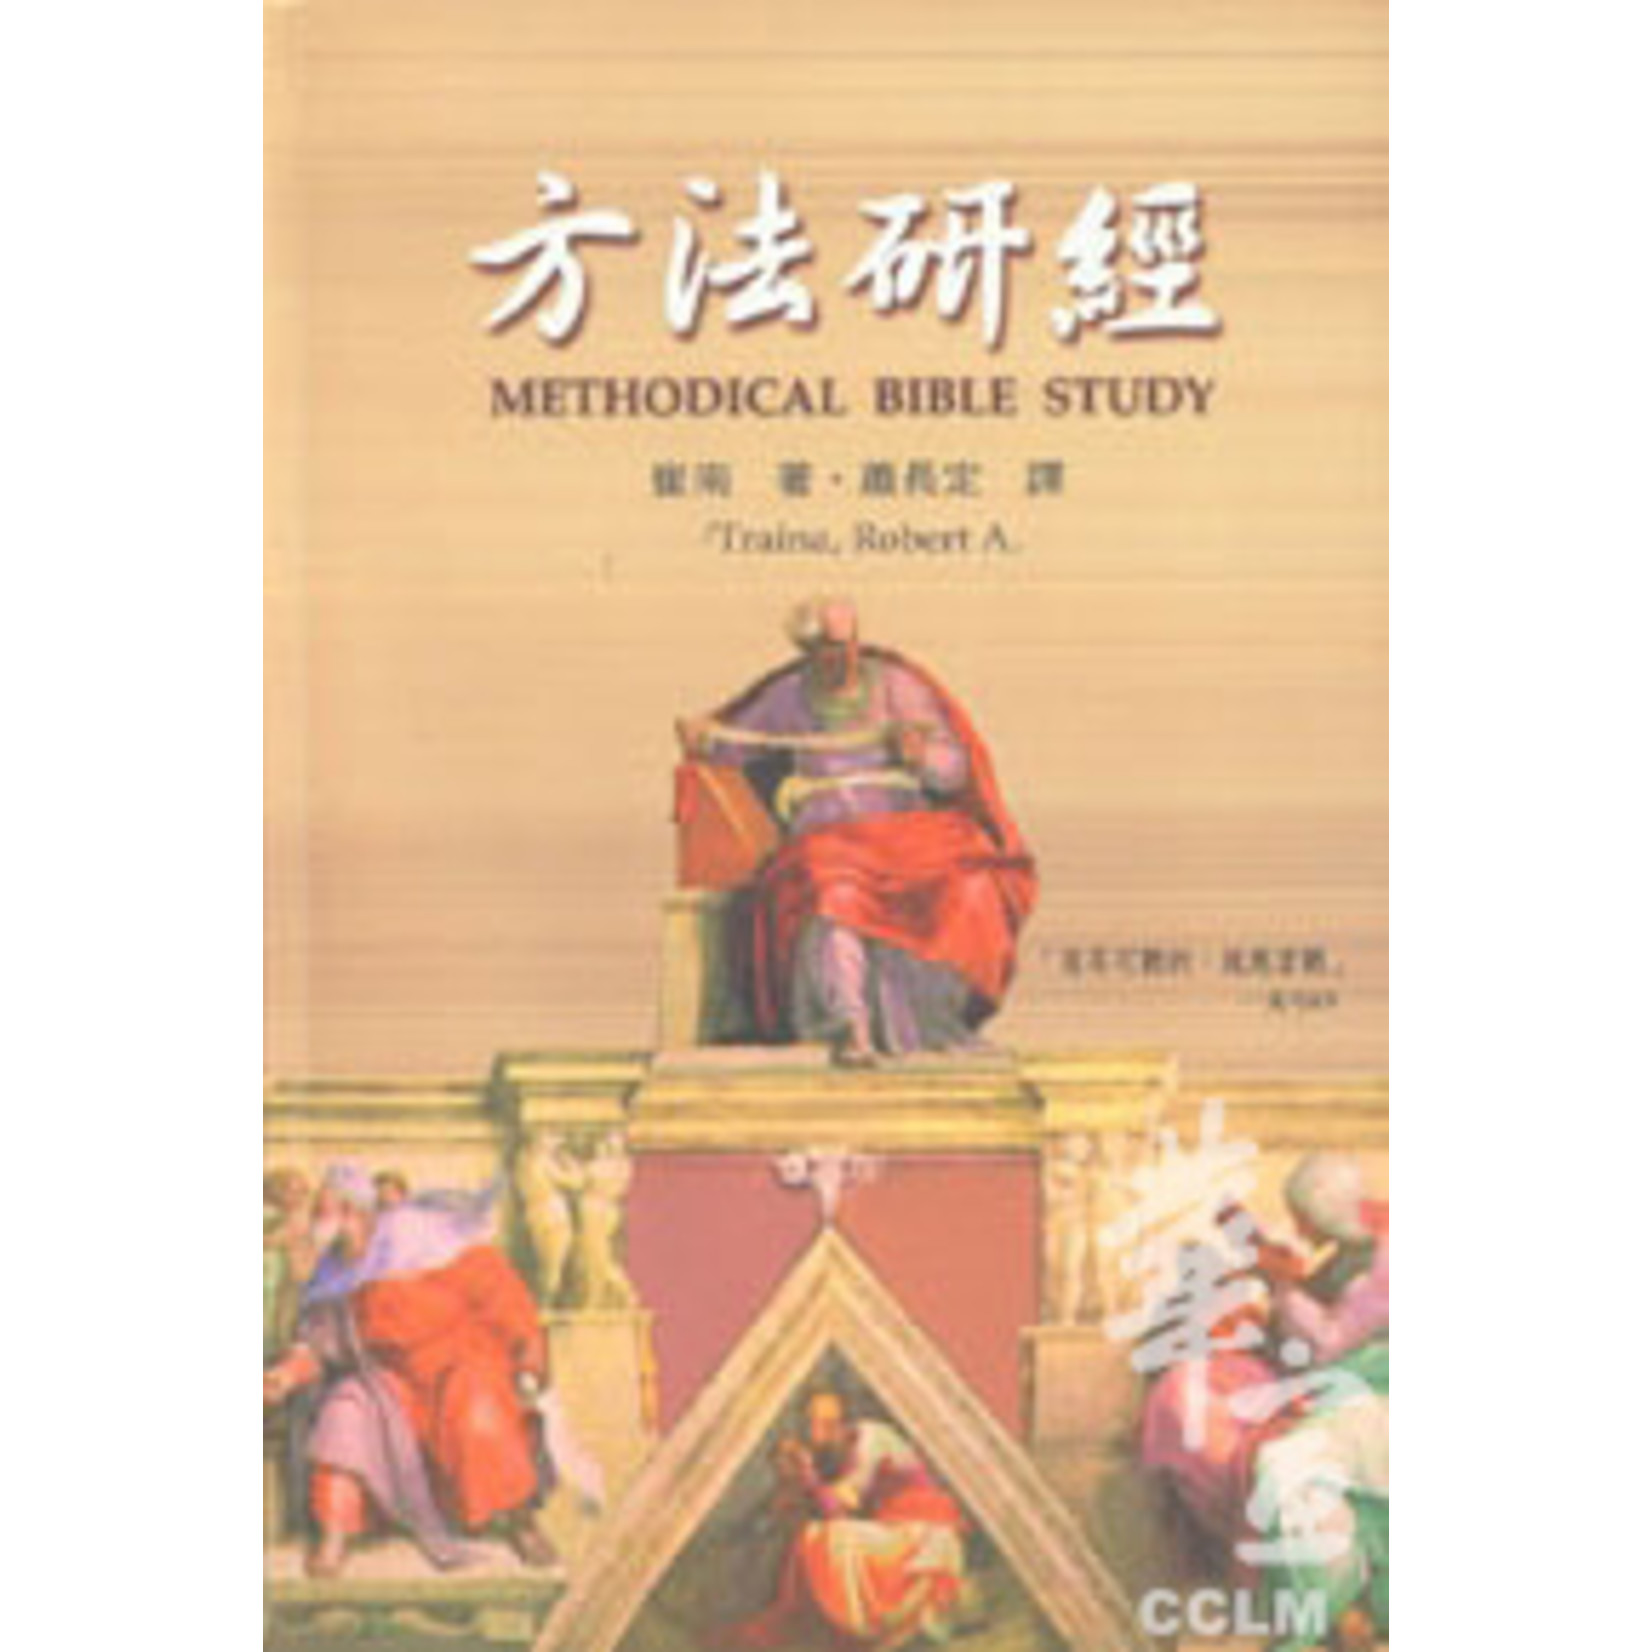 永望文化 (TW) 方法研經 Methodical Bible Study